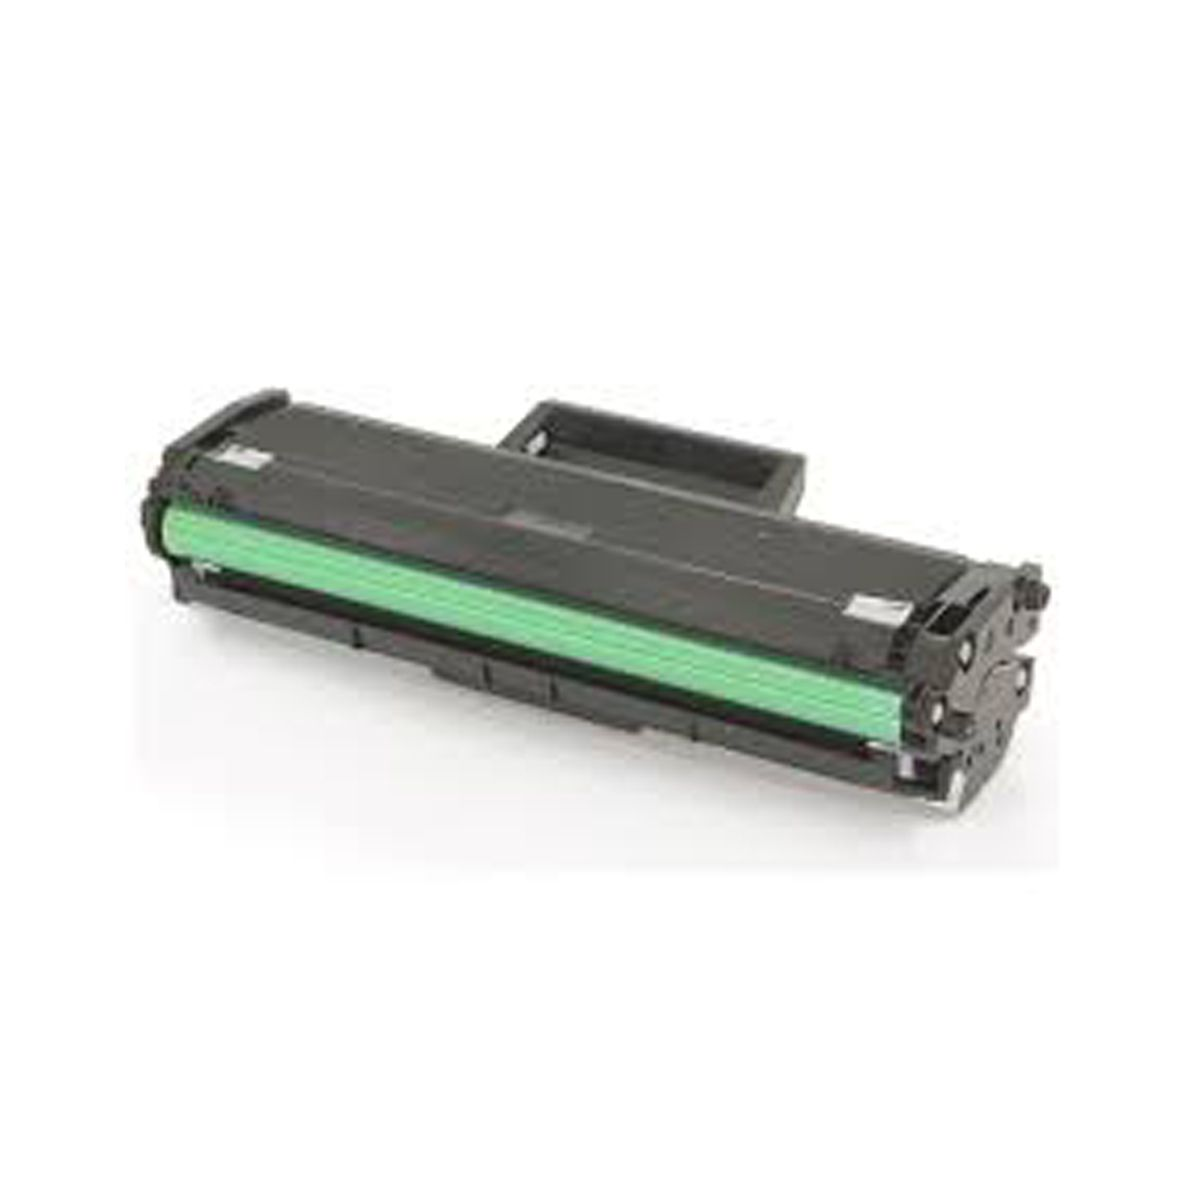 Toner Compativel D101S D101 101 - ML2160 ML2165 SCX3400  TJ-DB3L-ZDXS